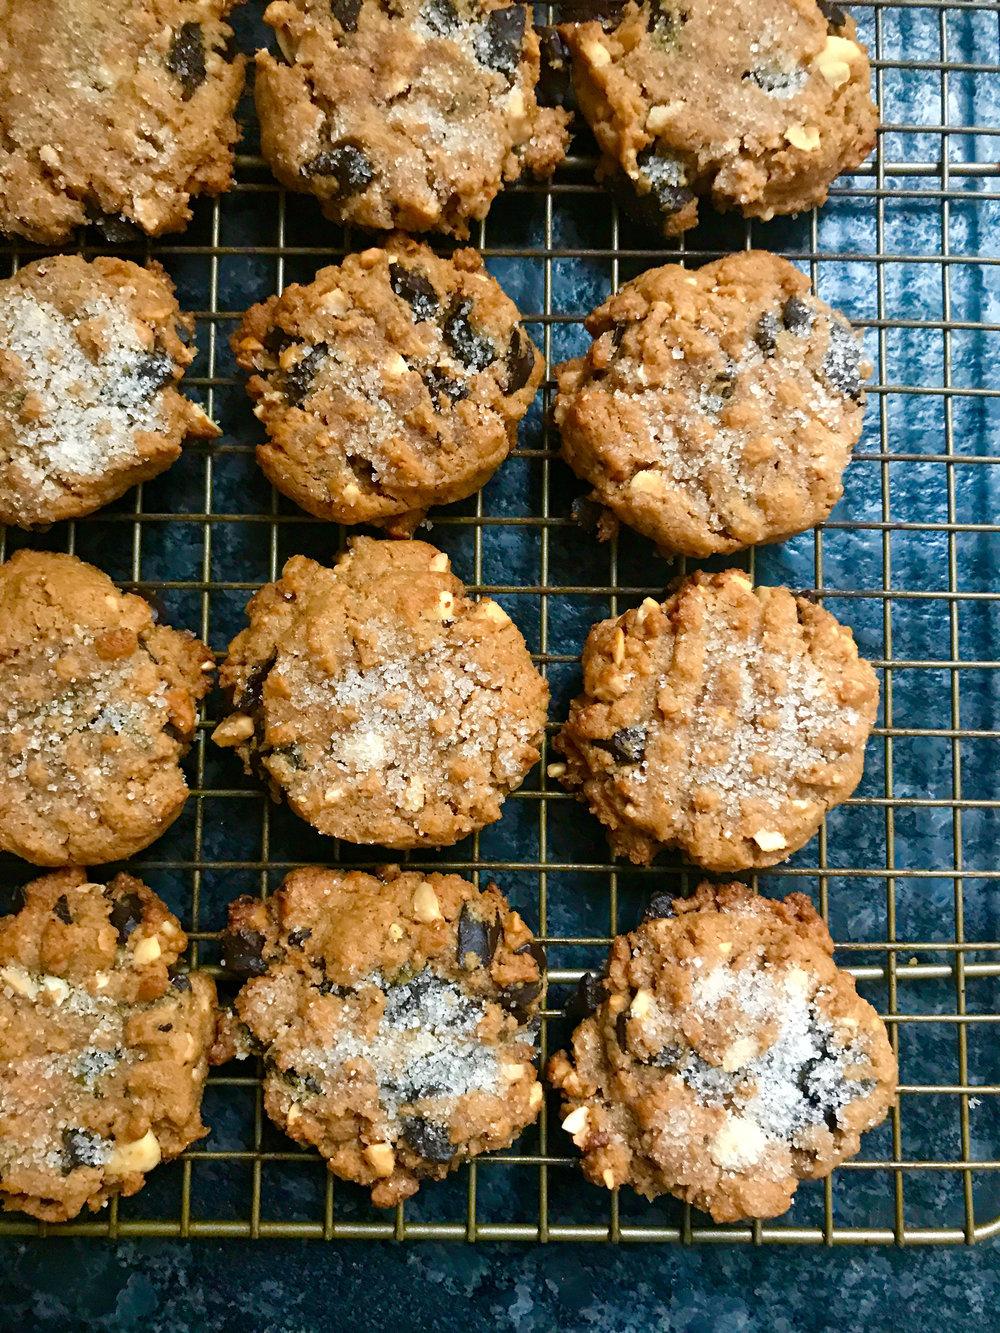 perfectpeanutbutterchocolatechunkcookies2.jpg